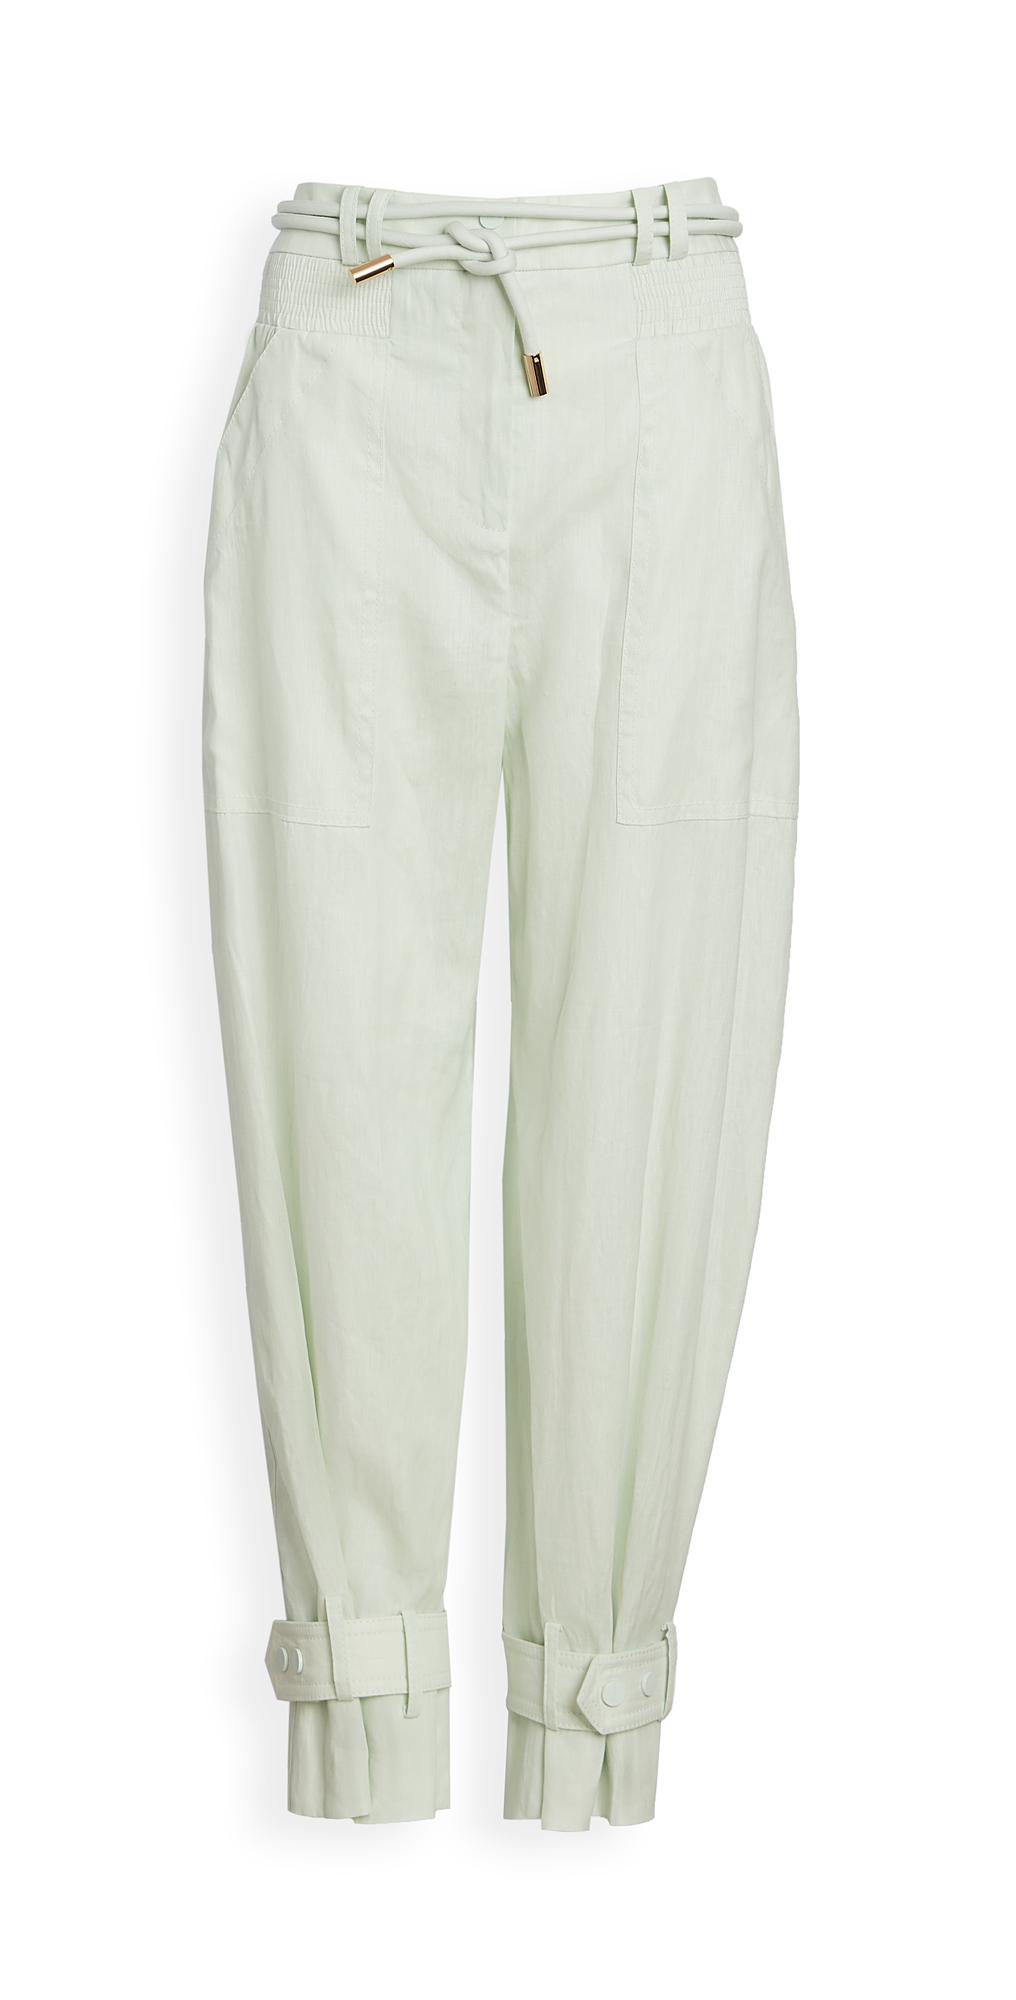 Zimmermann Glassy Slouch Army Pants